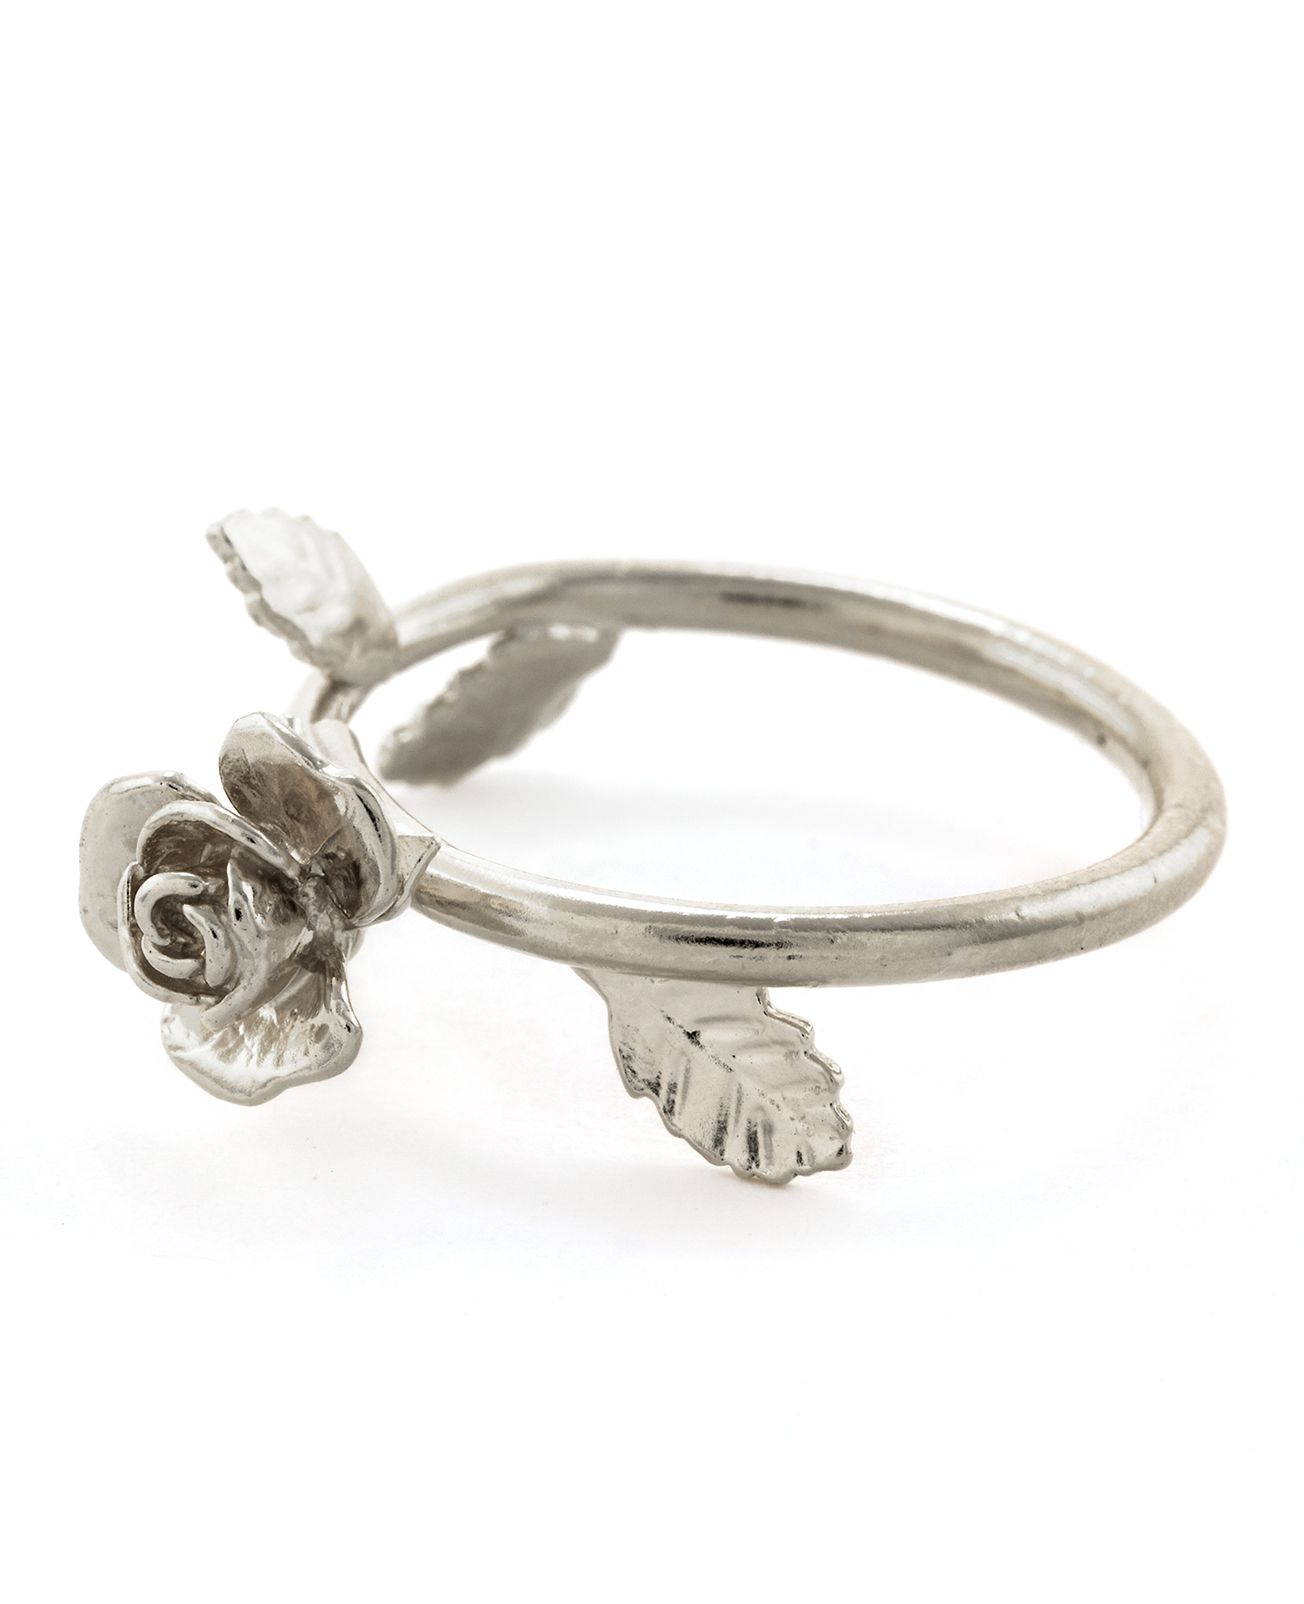 Rose ring wedding things uc pinterest rose ring and jewlery